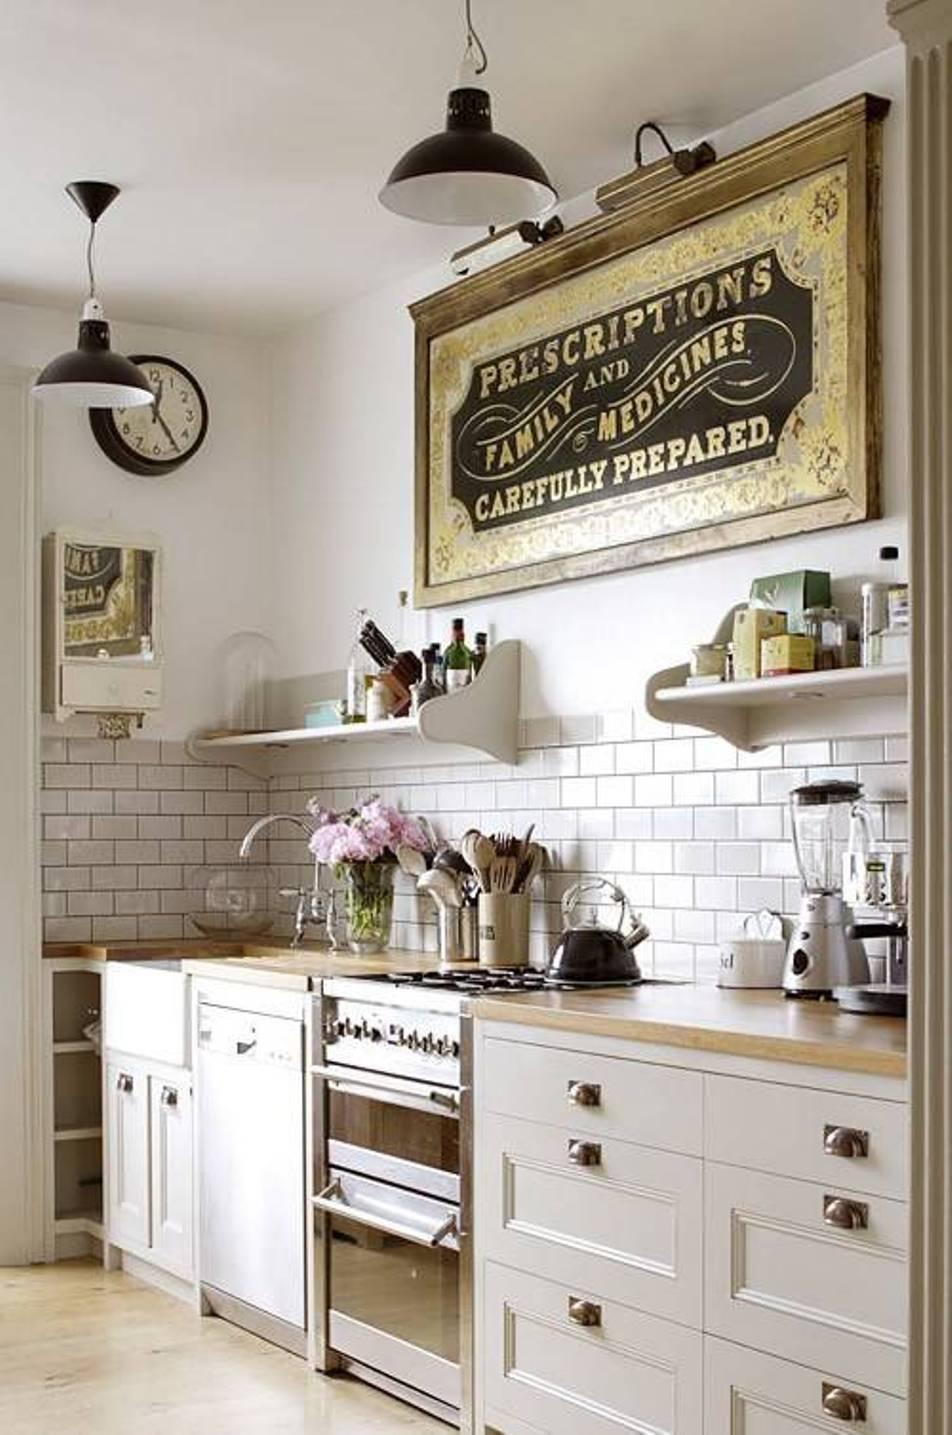 Kitchen : Kitchen Farmhouse Kitchen Decor Ideas With Brick Kitchen in Latest Farmhouse Wall Art